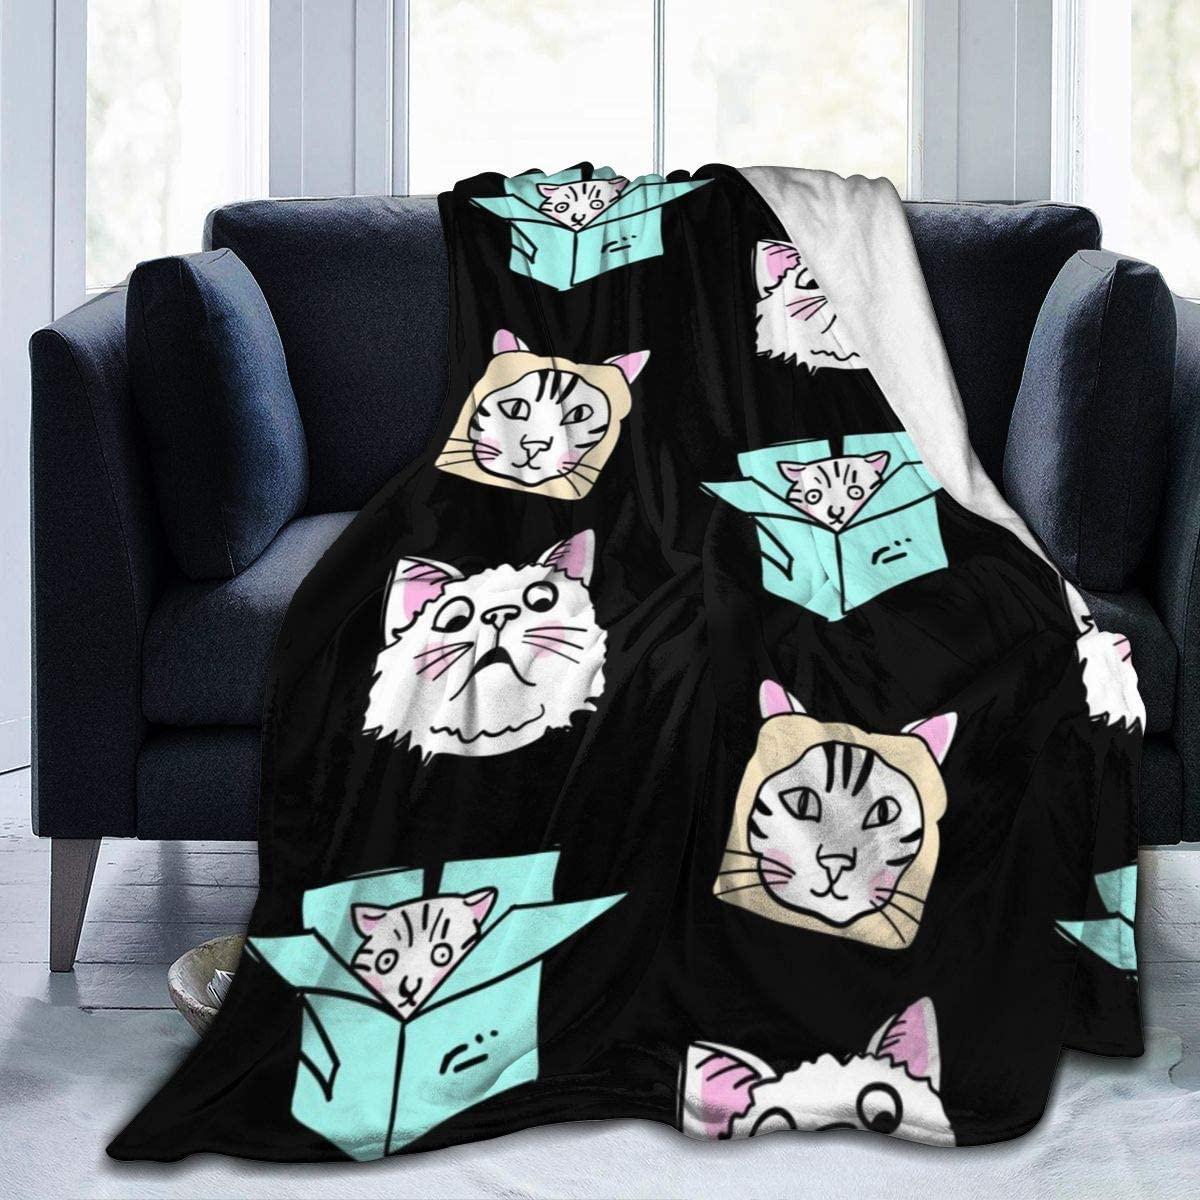 Micro Fleece Plush Soft Baby Blanket Cute Funny Cartoon Cat Magic Kitten Fluffy Warm Toddler Bed/Crib Blanket Lightweight Flannel Daycare Nap Kids Sleeping Tummy Time Throw Blanket Girls Boy Kid/Baby